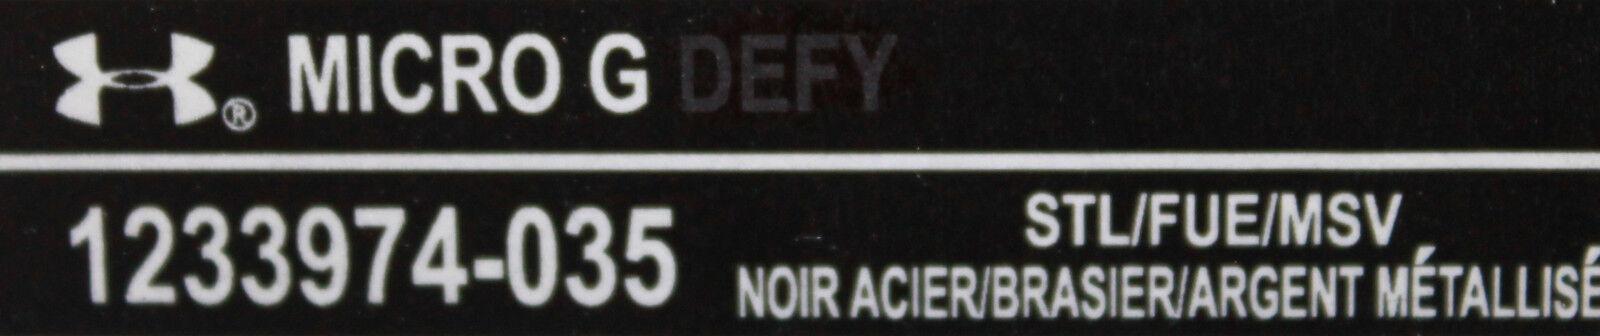 New Mens Mens Mens Micro G Defy  Running schuhe Größe 10 Style   1233974-035 faacb5